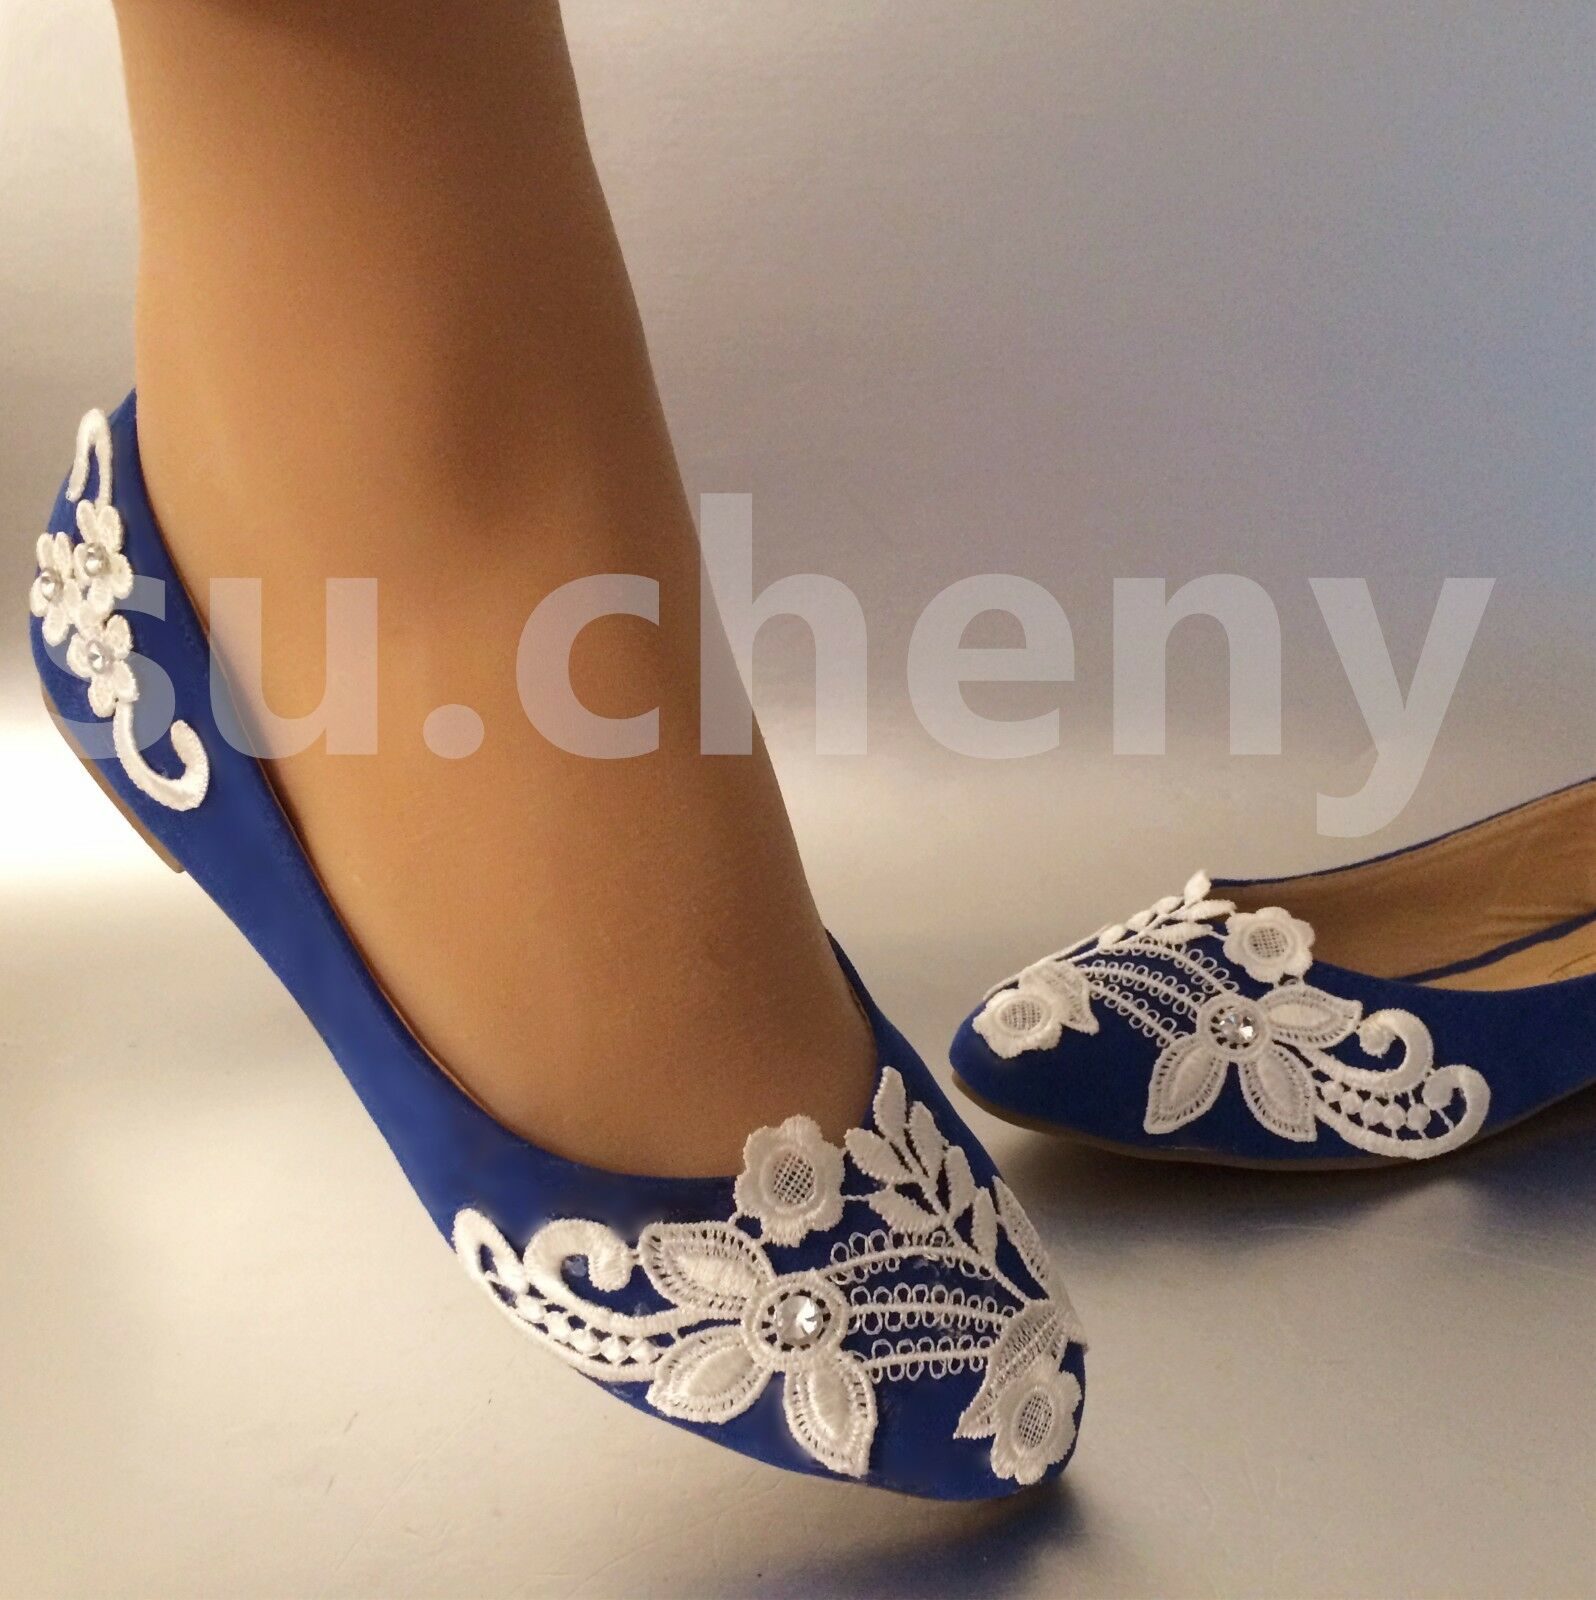 su.cheny Sapphire blue lace flower Wedding flat Bridal Bridesmaid shoes